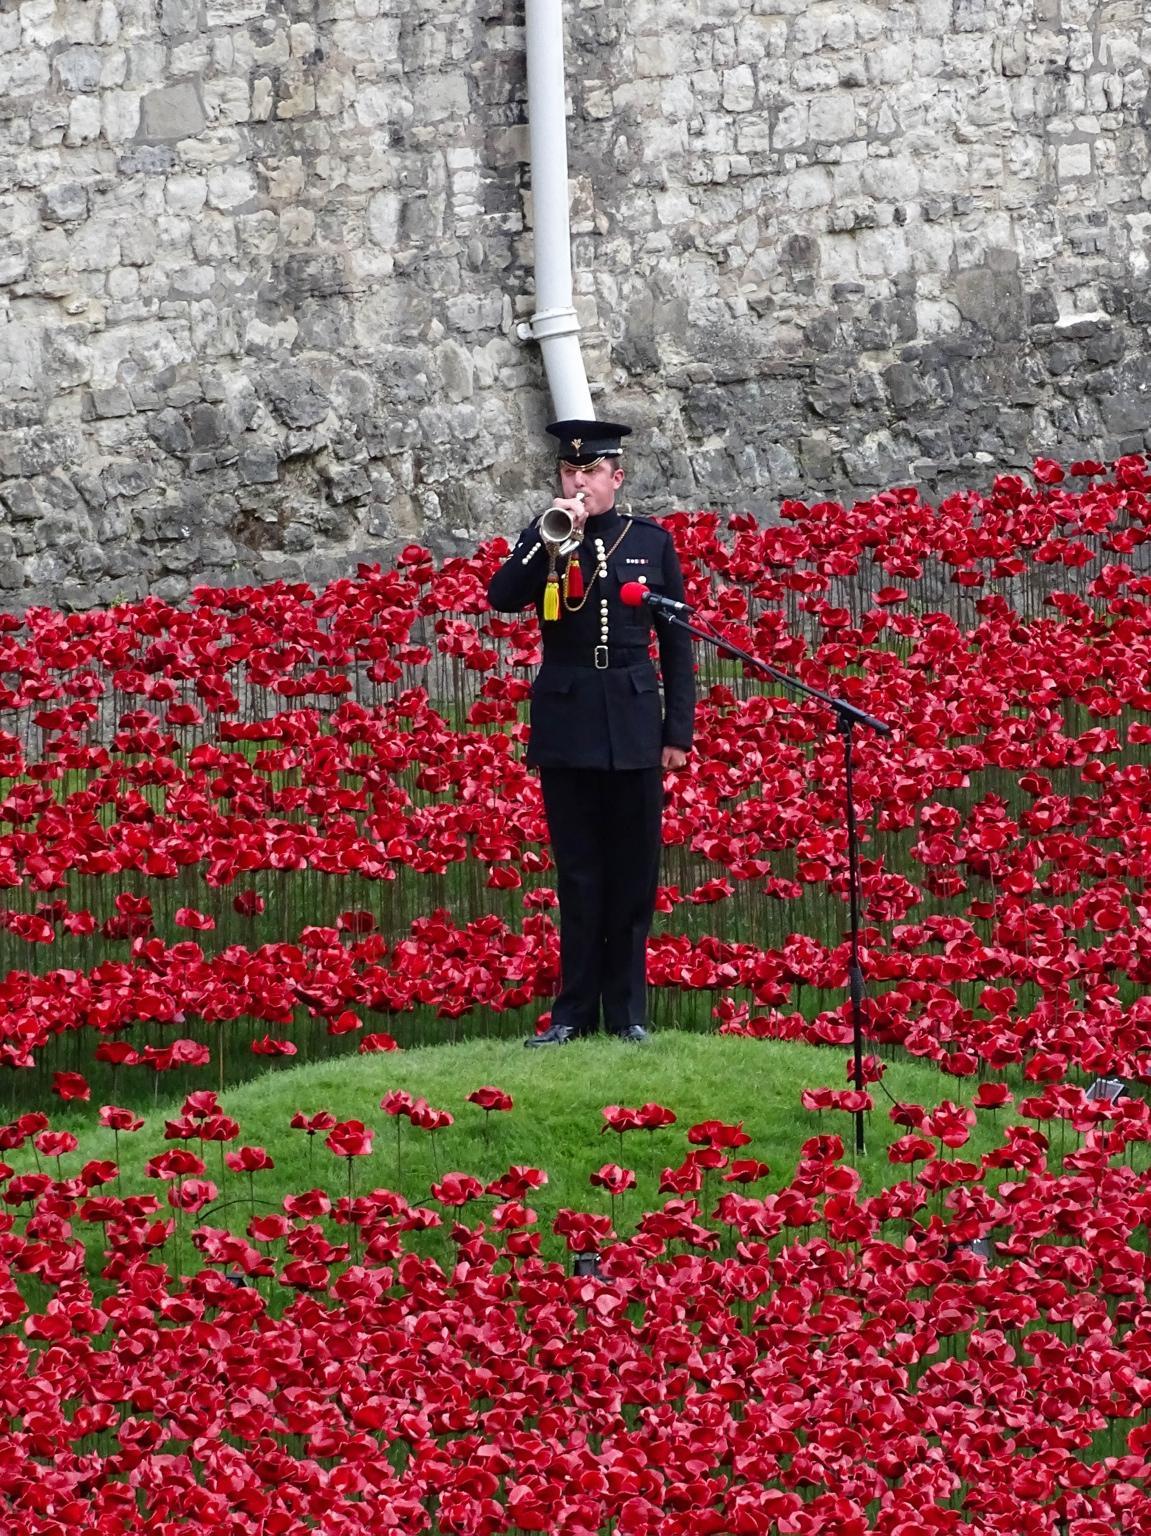 The Bugler playing the Last Post at the Tower of London last night. #WW1 #WW1Centenary http://t.co/WcONMrpK5u